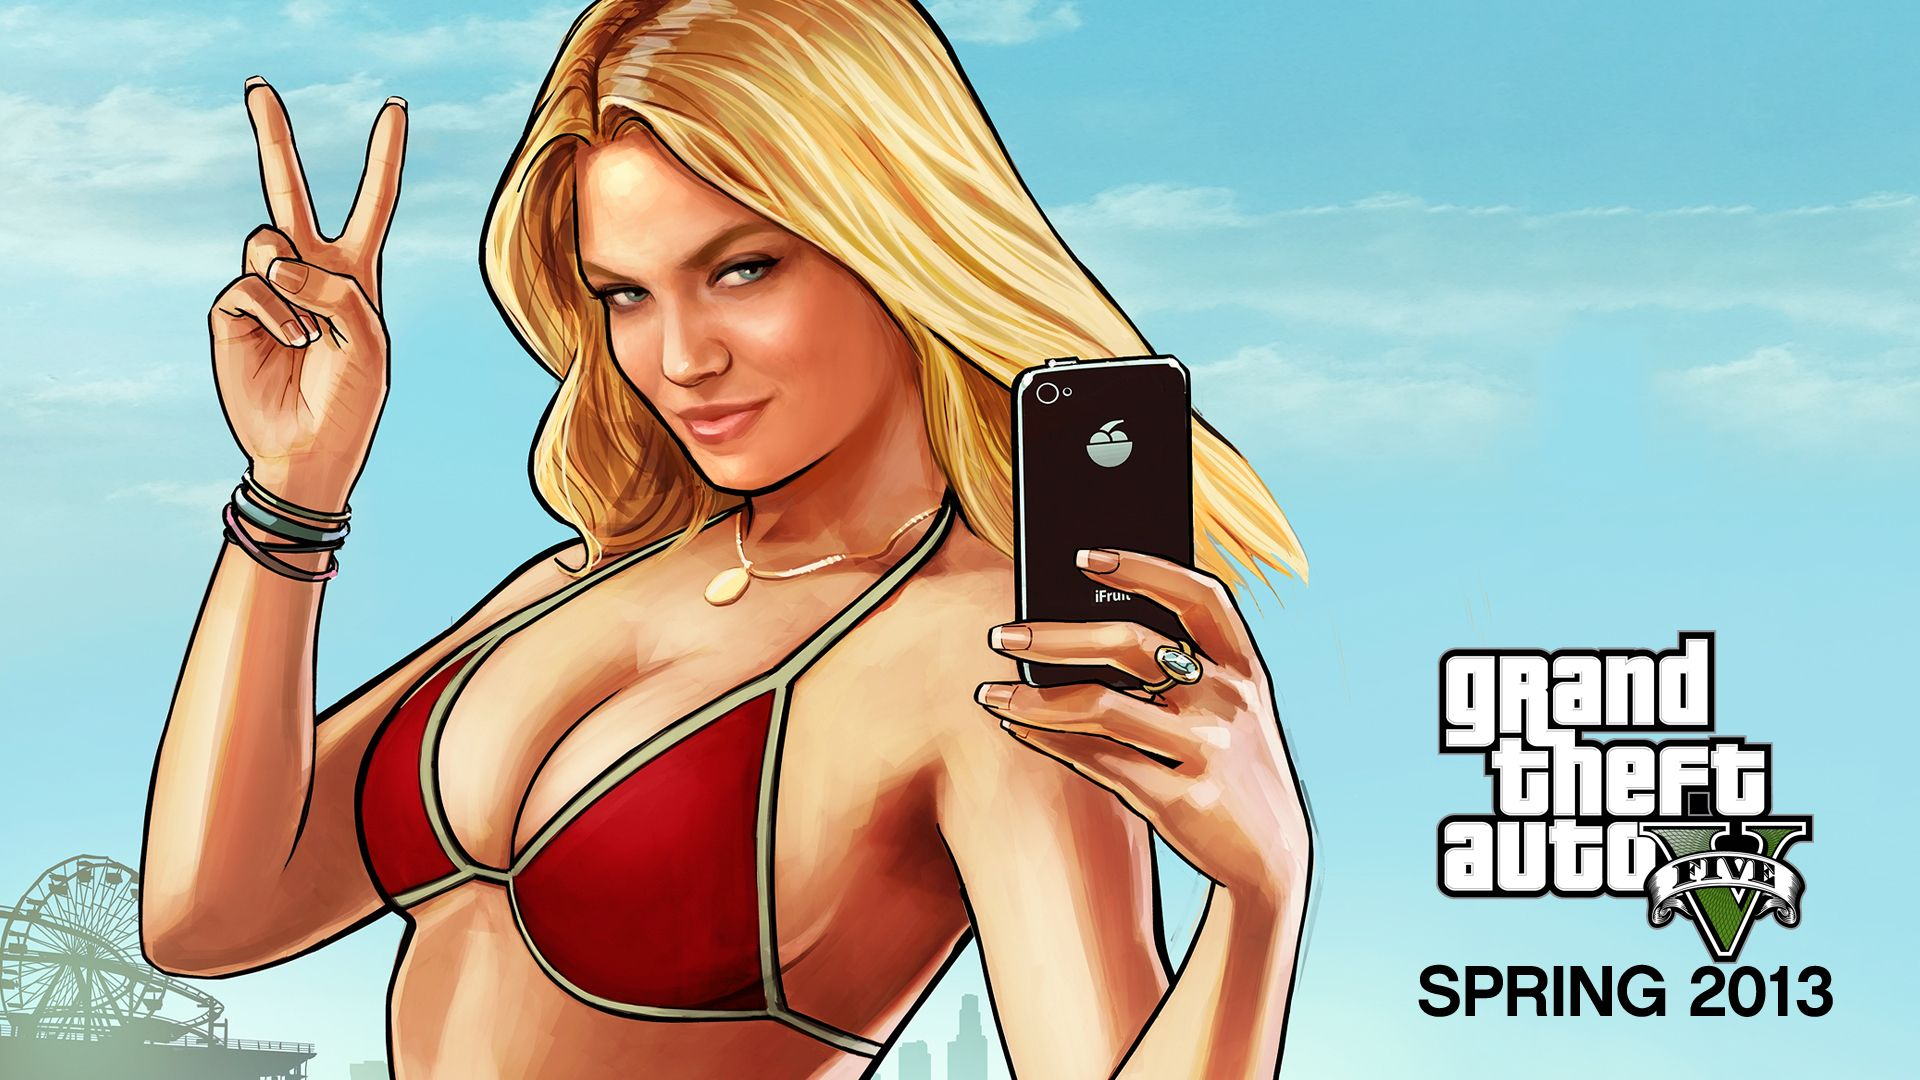 Grand Theft Auto Gta 5 Girl Character Wallpaper Hd -5417